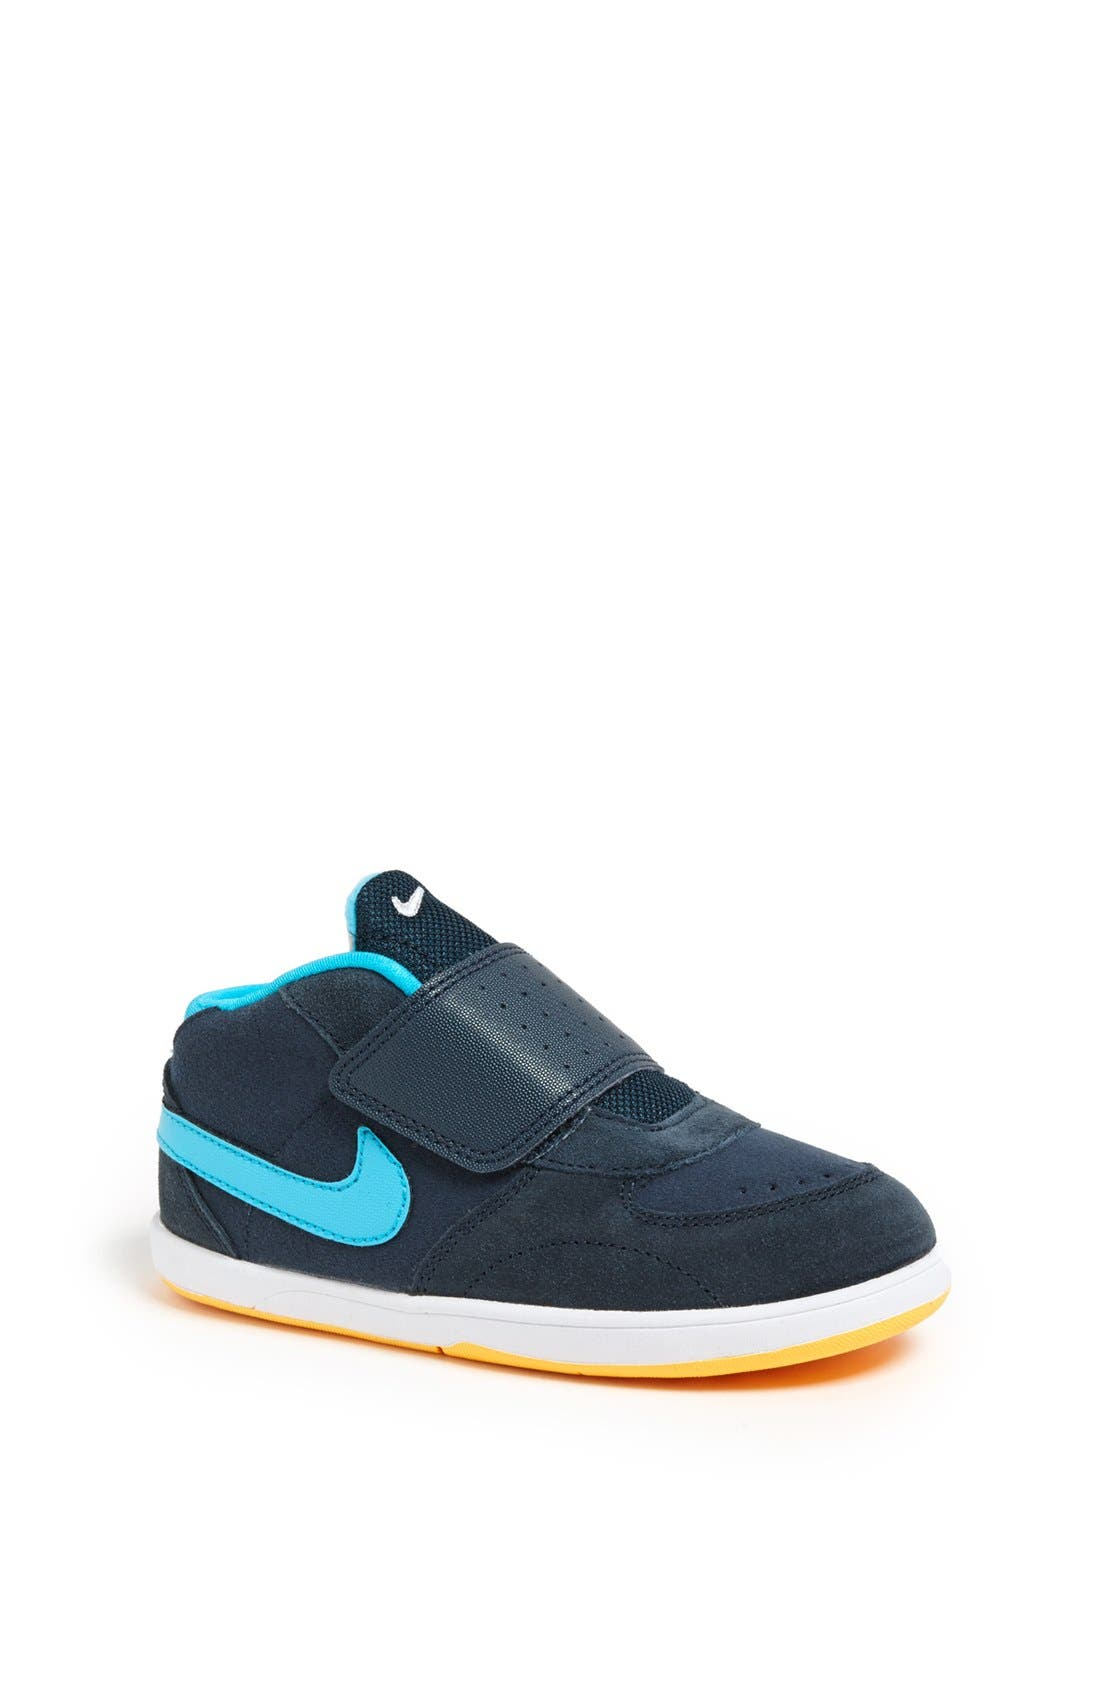 Alternate Image 1 Selected - Nike 'Mavrk Mid' Athletic Shoe (Baby, Walker & Toddler)